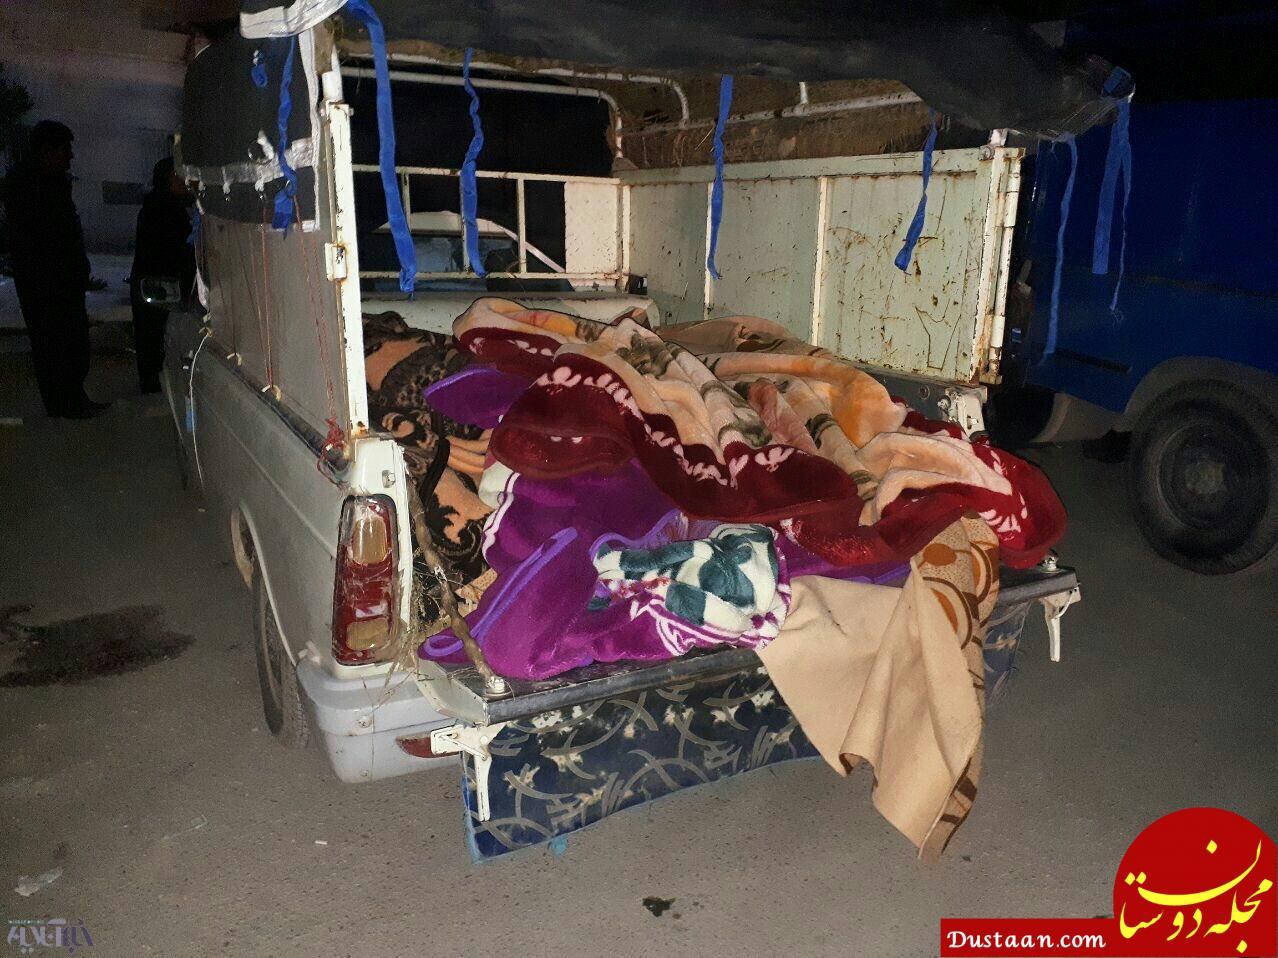 www.dustaan.com عکس دلخراش از قربانیان زلزله شدید قصر شیرین